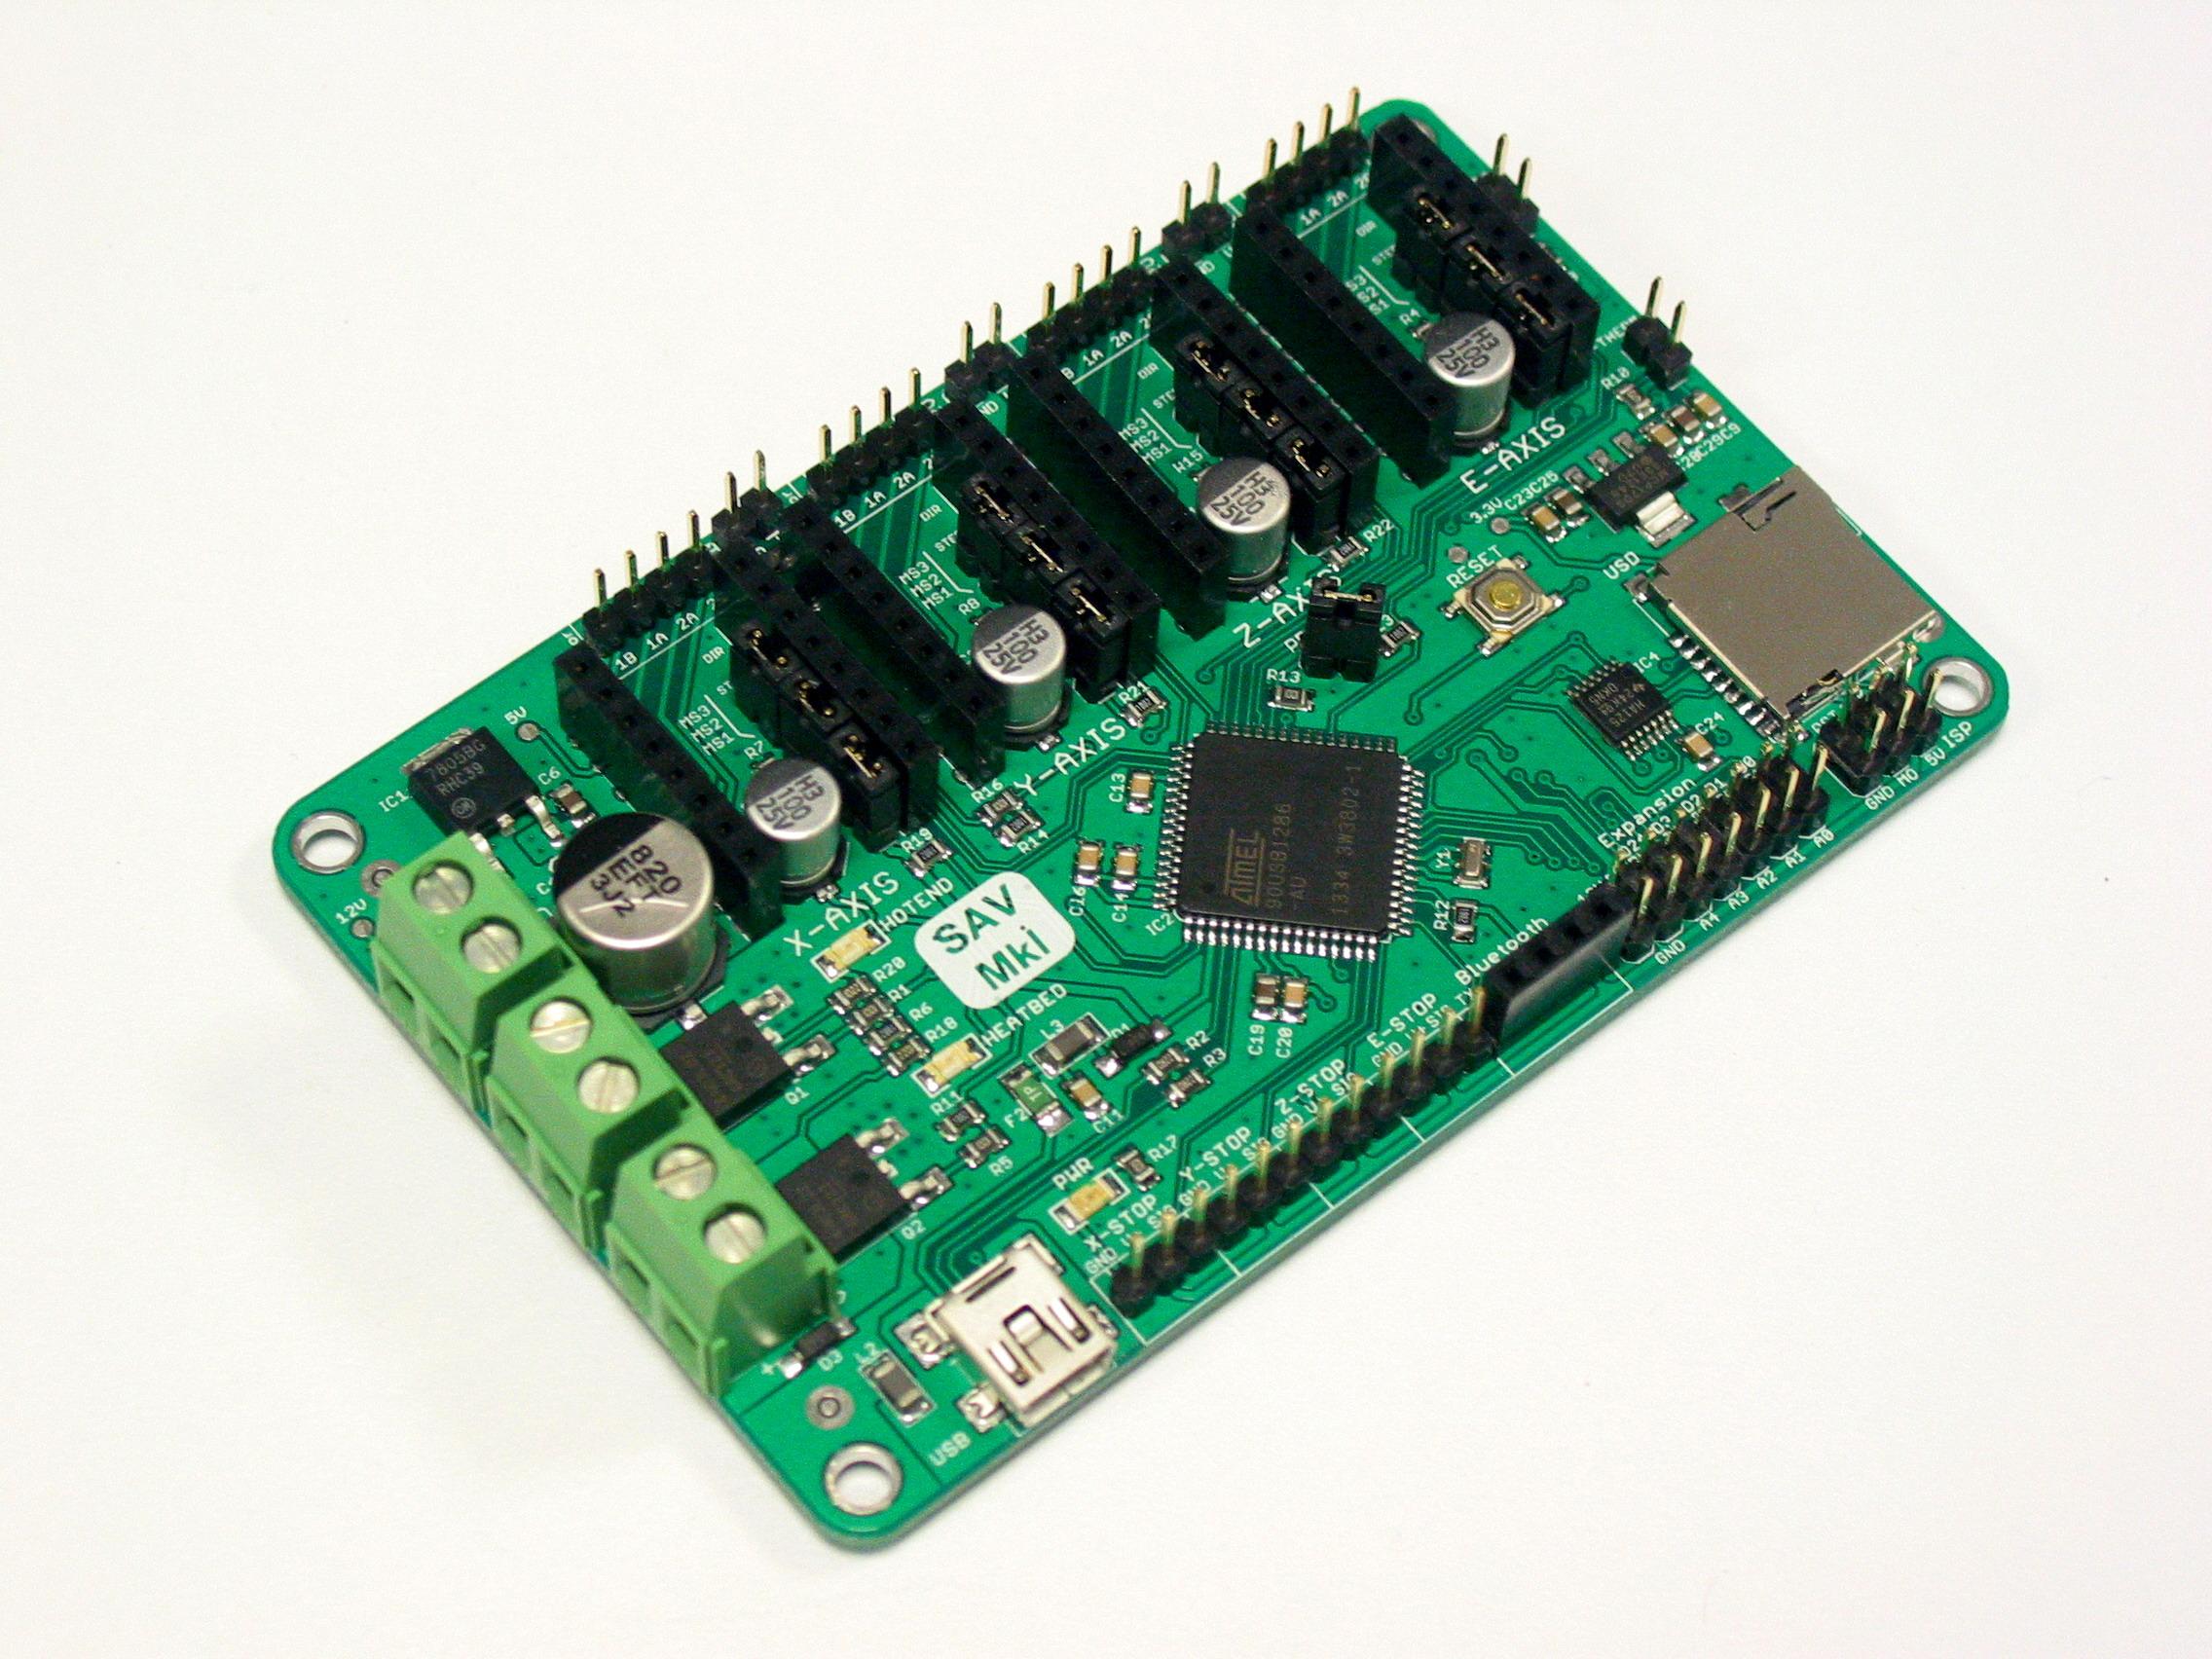 Sav Mki 3d Printer Electronics Indiegogo Electric Circuit Board Processor Tshirt